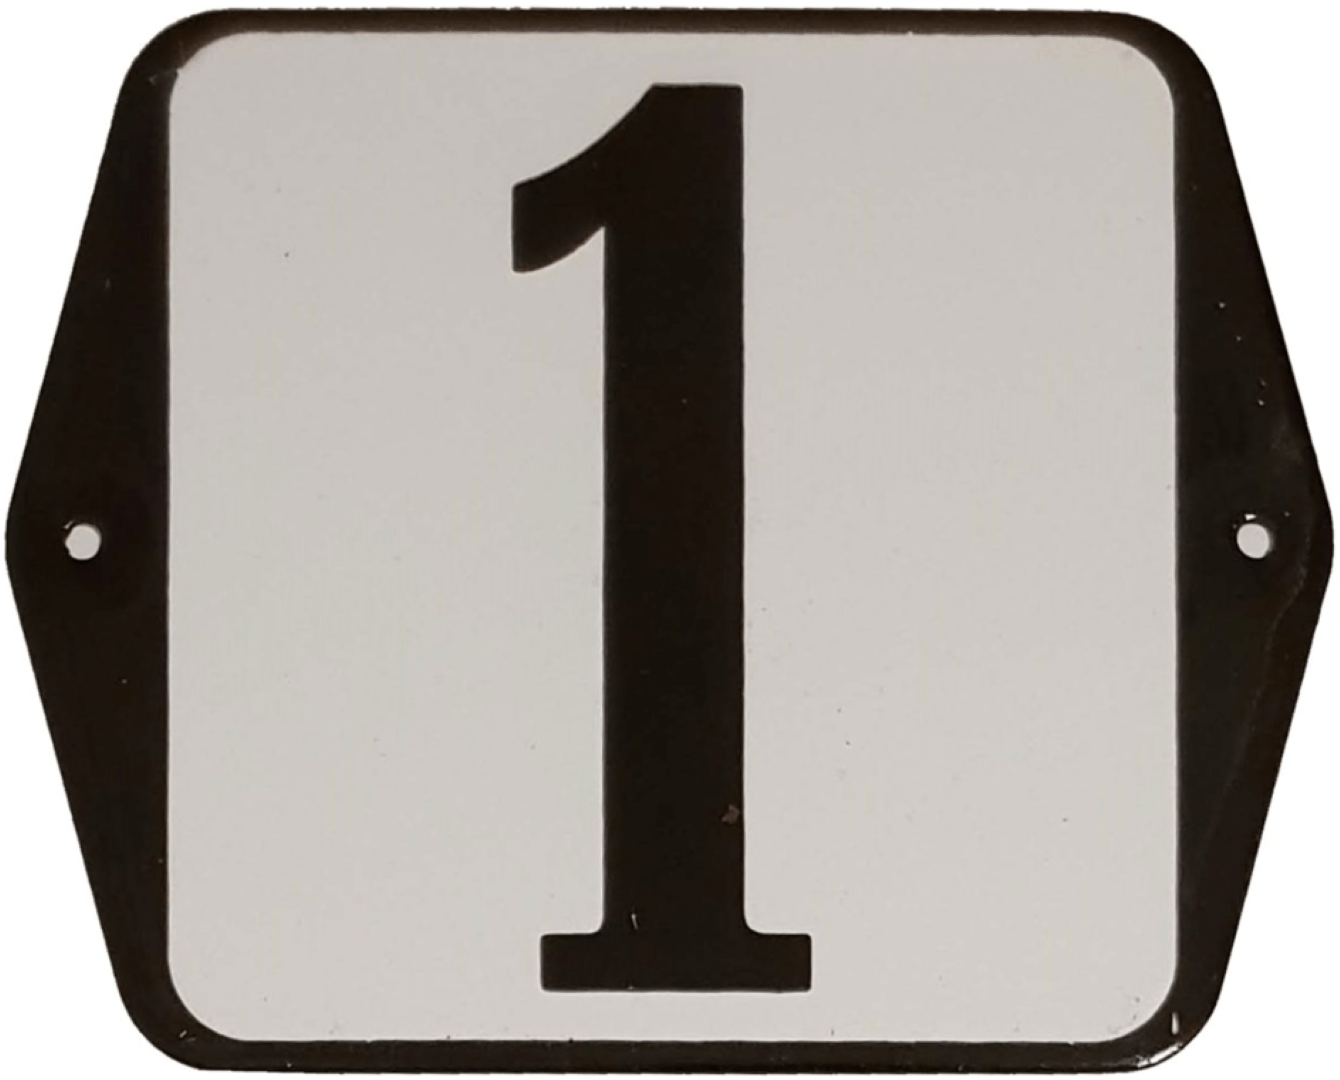 Huisnummer standaard nummer 1